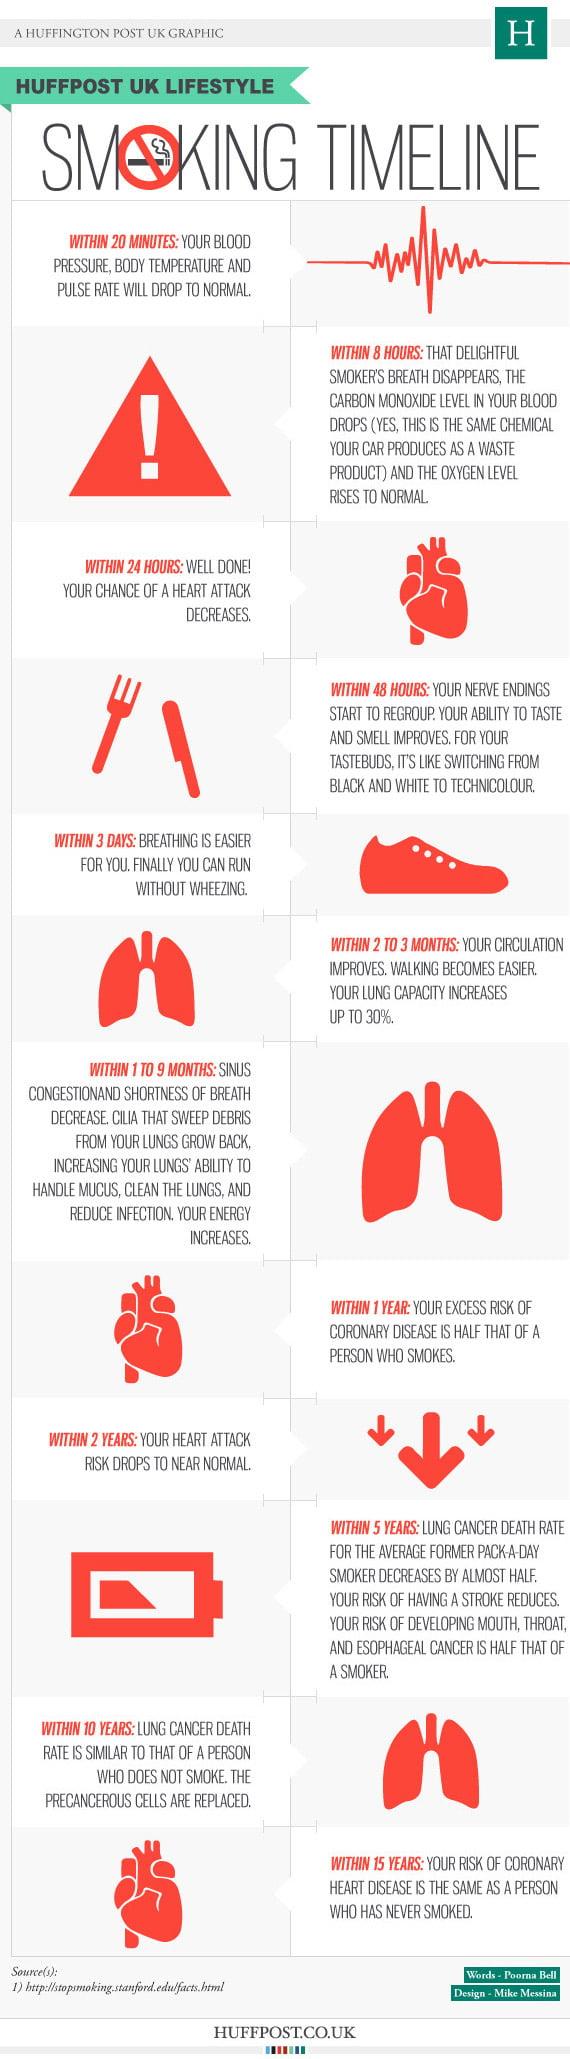 quit-smoking-timeline-6